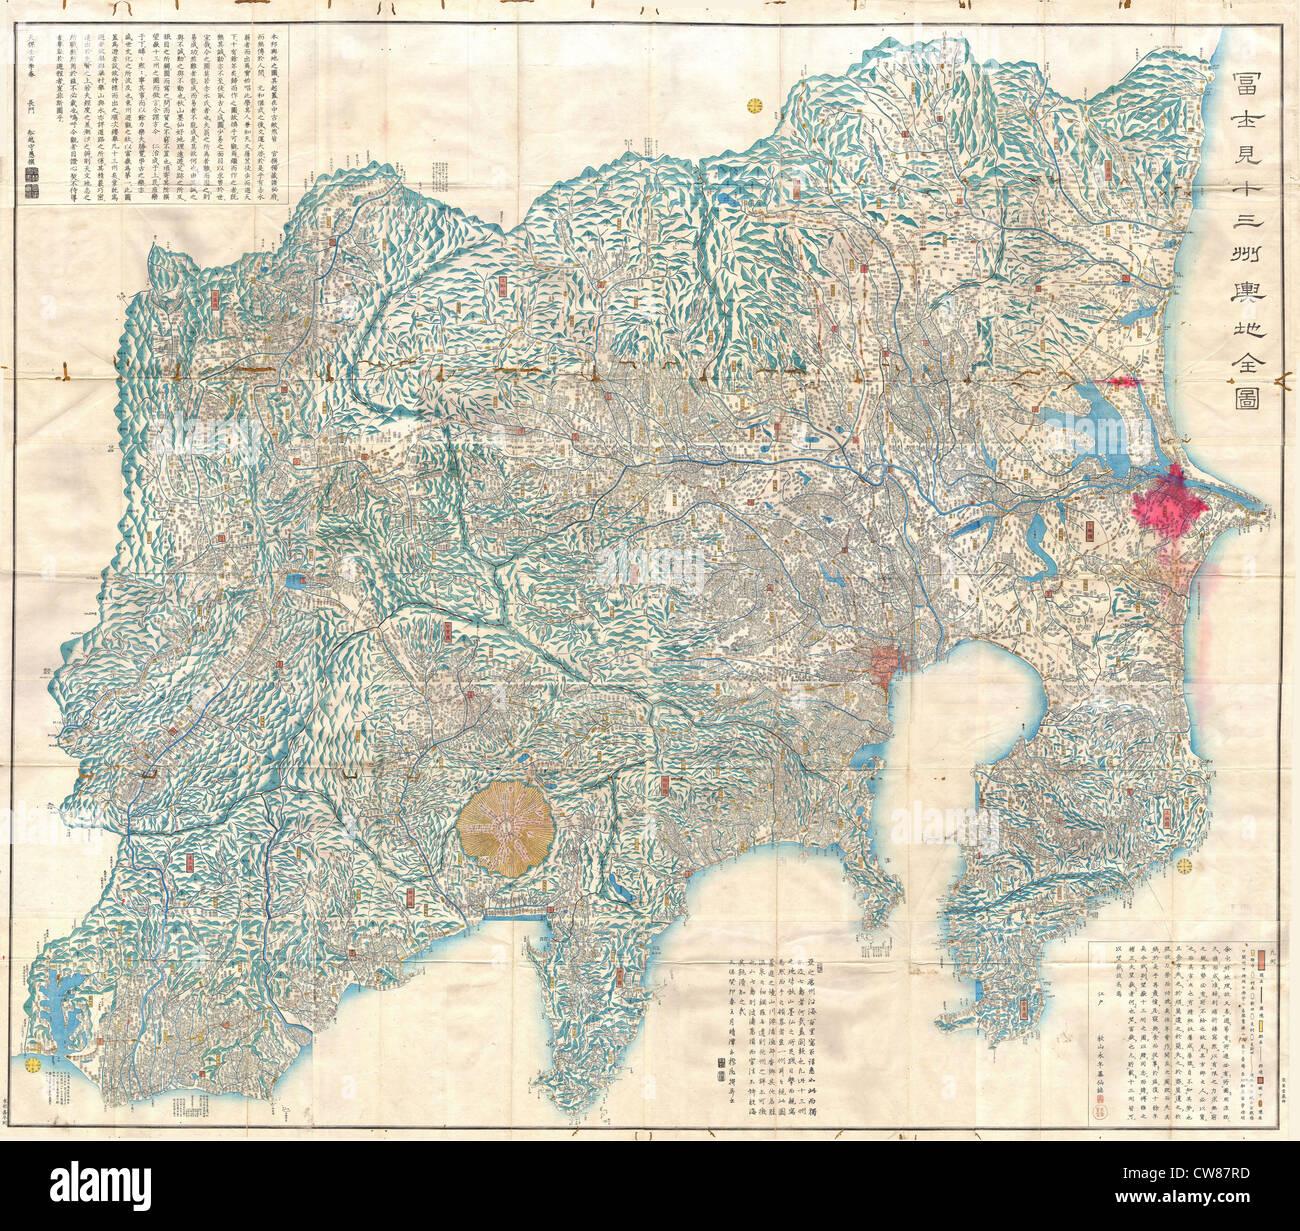 1843 Tienpo période Edo 14 Plan de Mt. Fuji, Tokyo, et environs Photo Stock